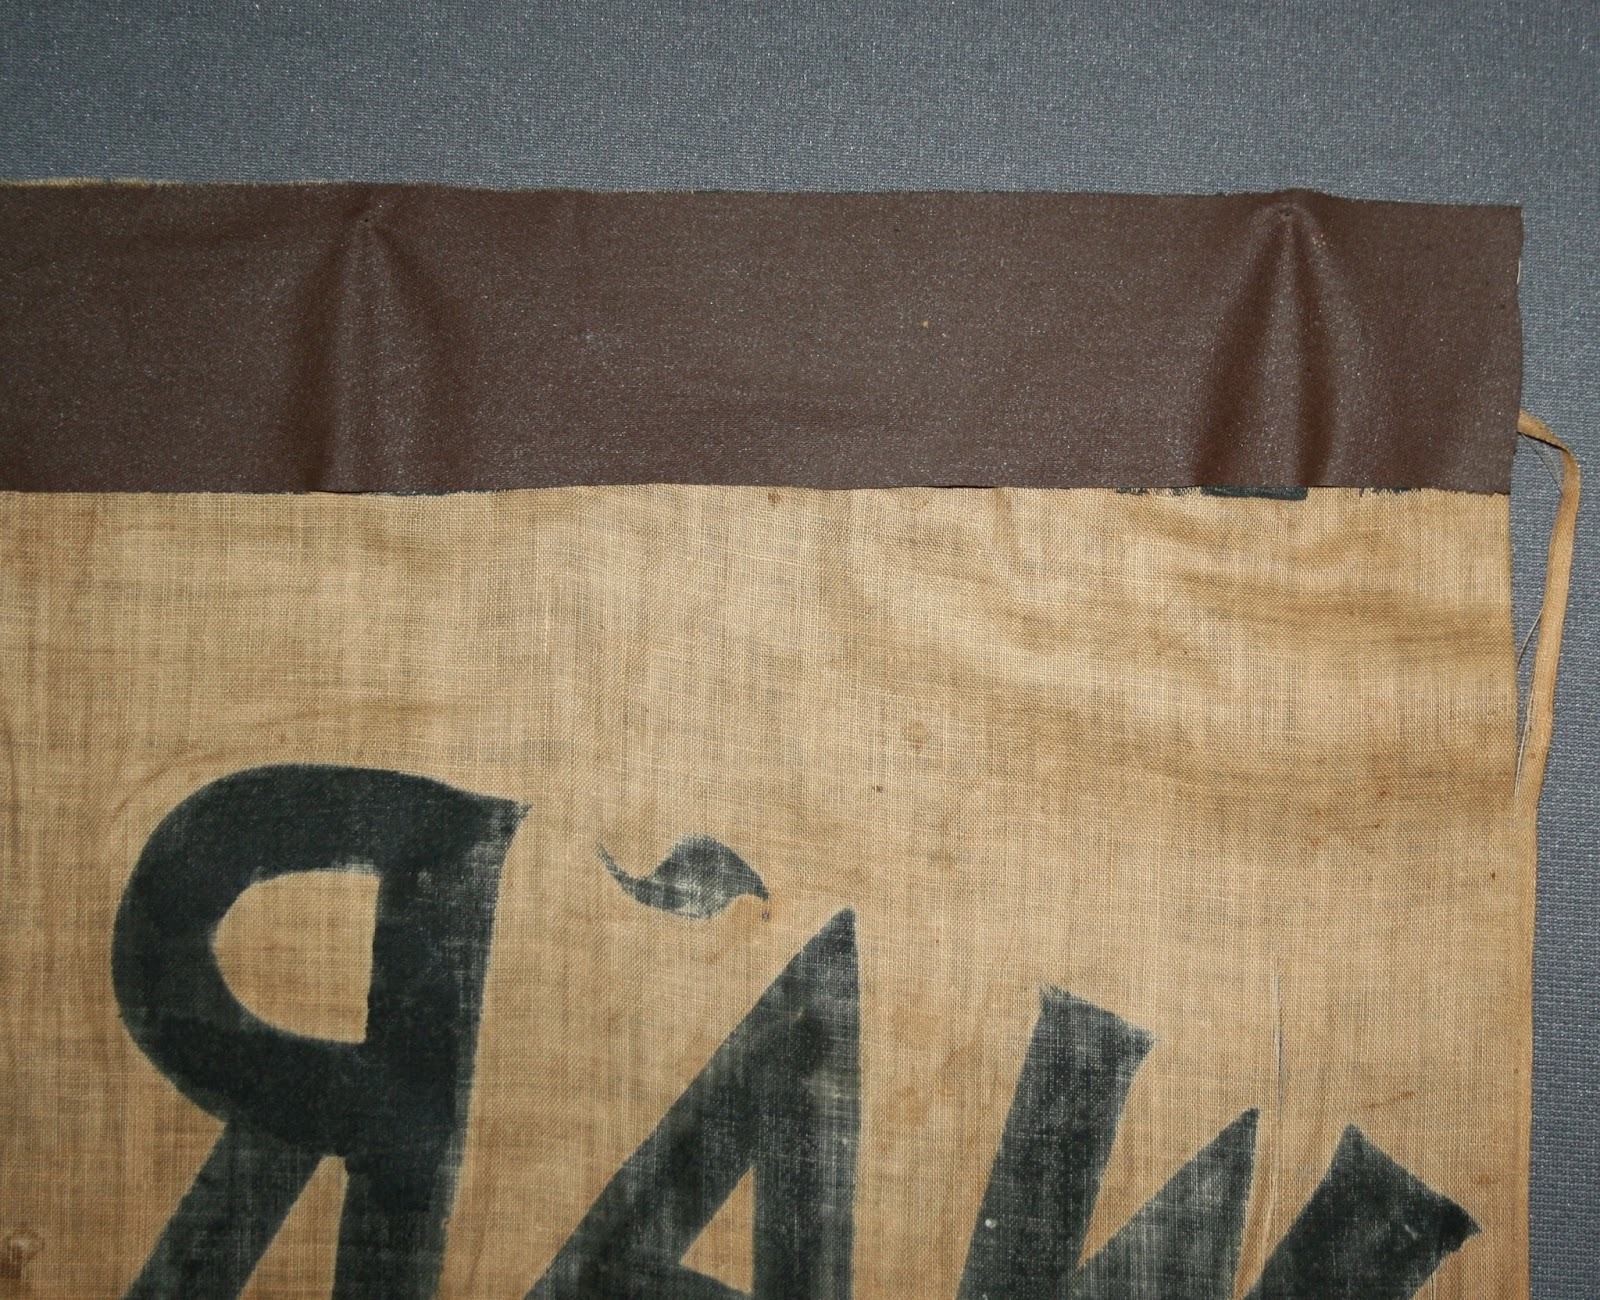 old repair to civil war banner, art conservator needed